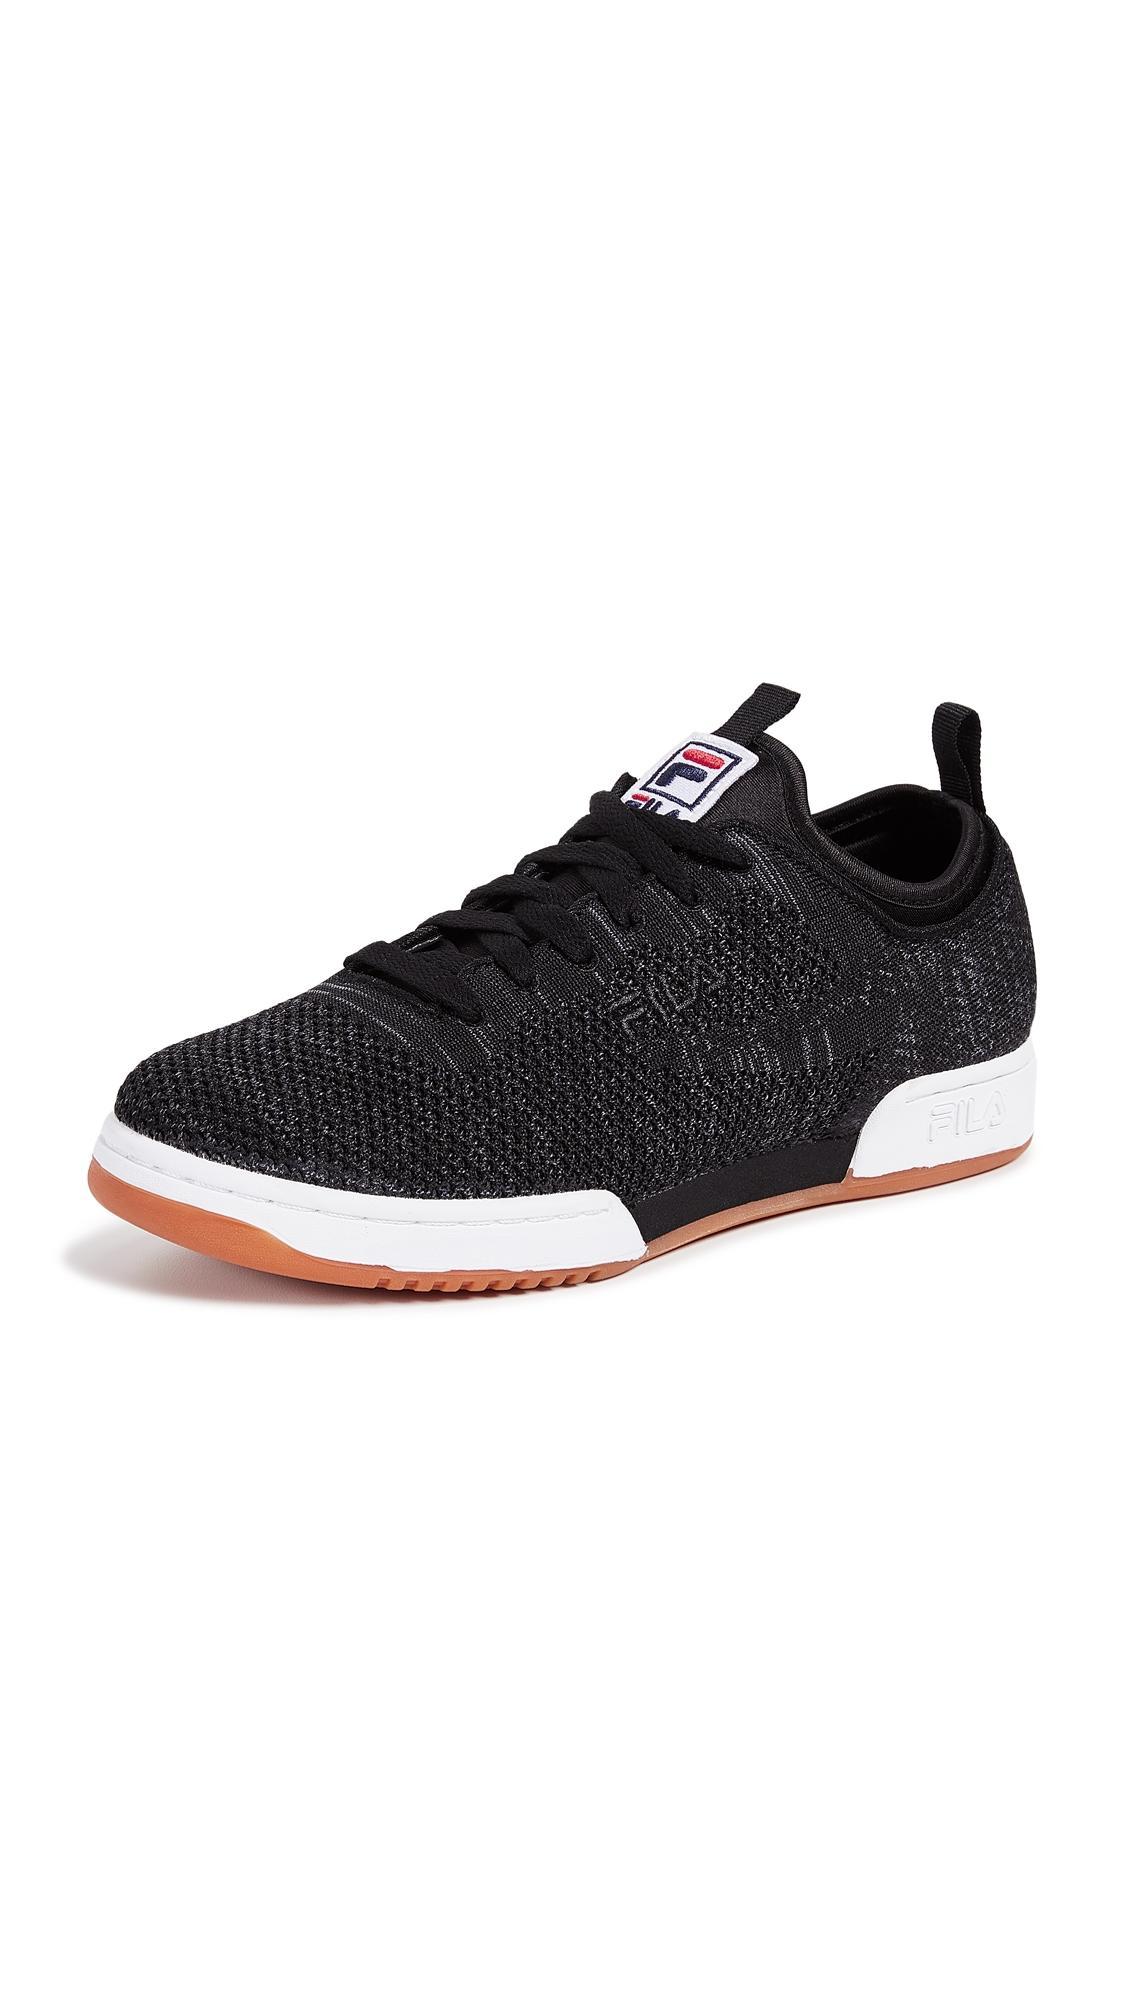 finest selection 8feea fcd9d Fila Original Fitness 2.0 Sneakers In Black White Gum